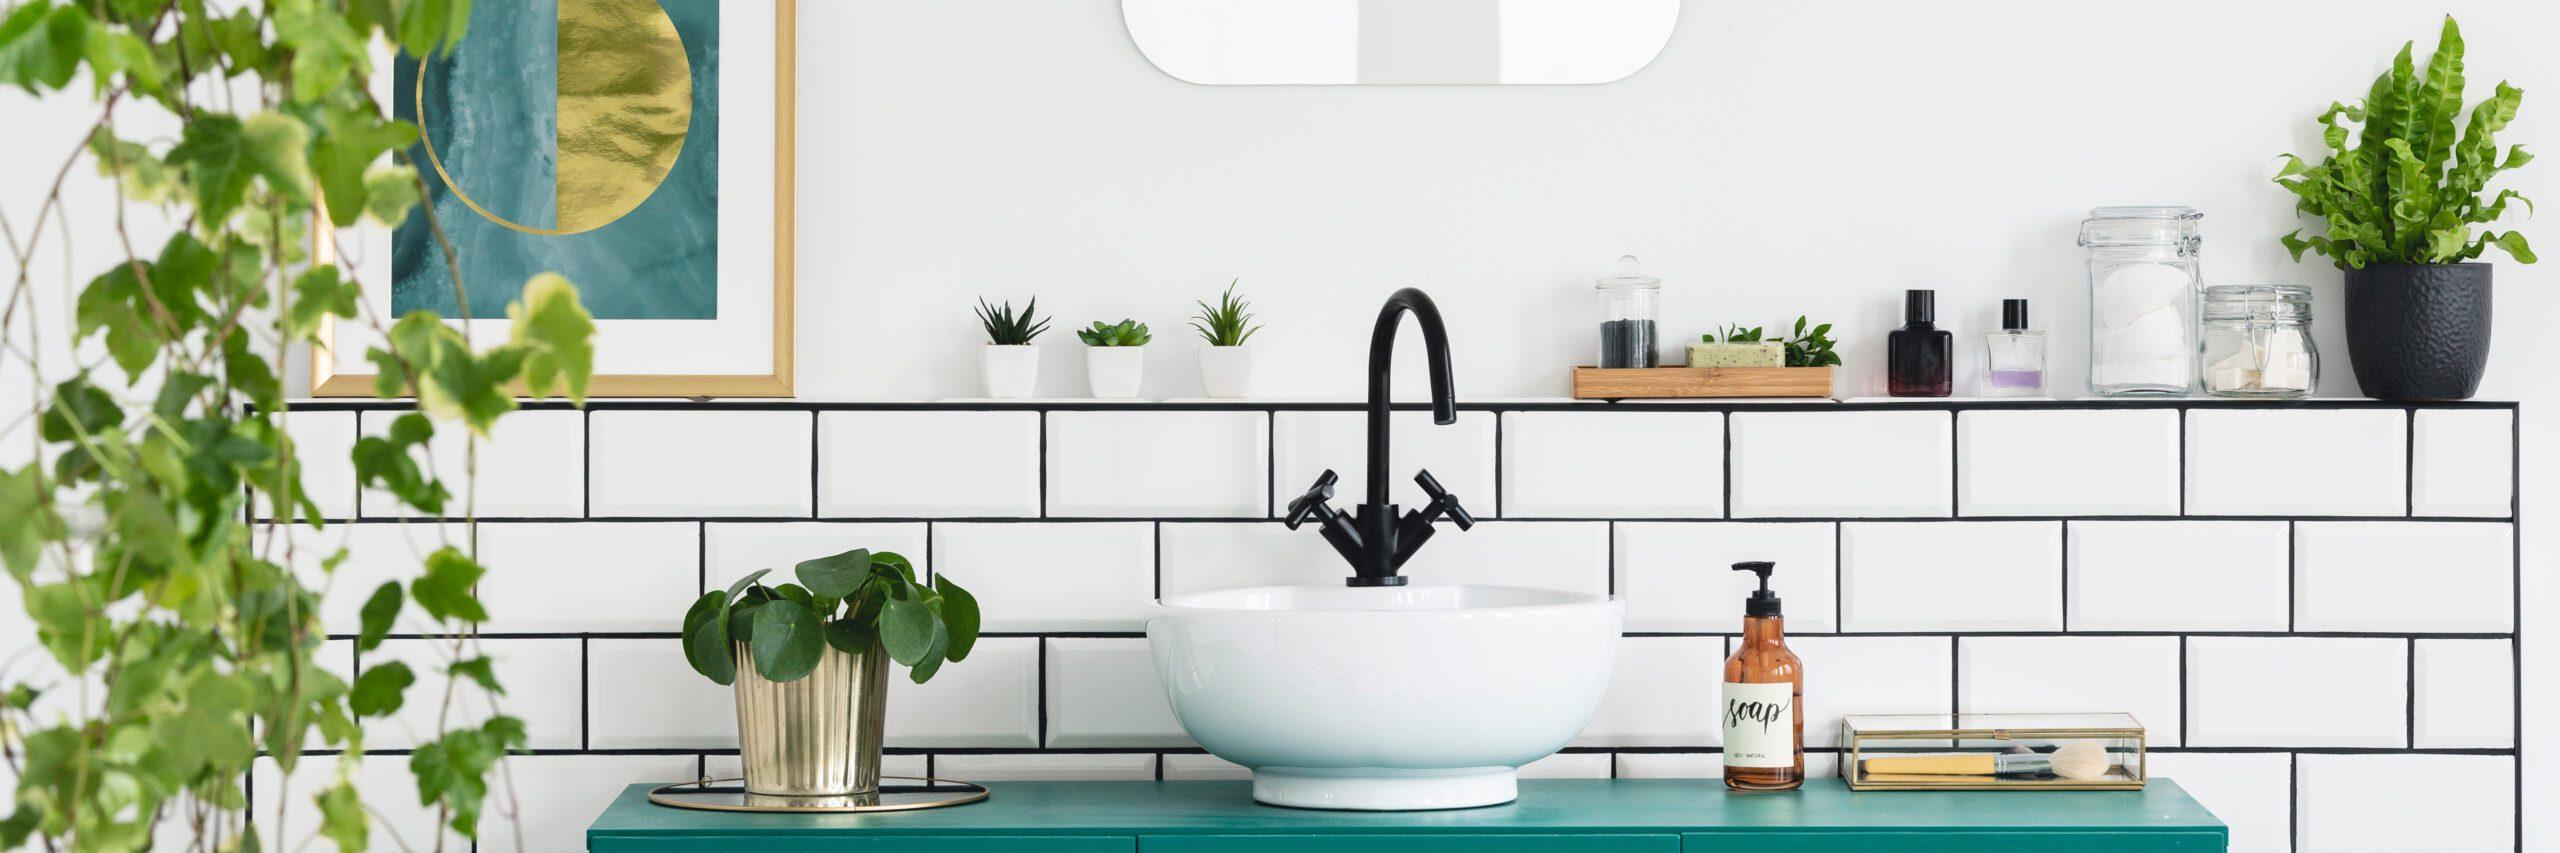 Spring cleaning checklist - bathroom